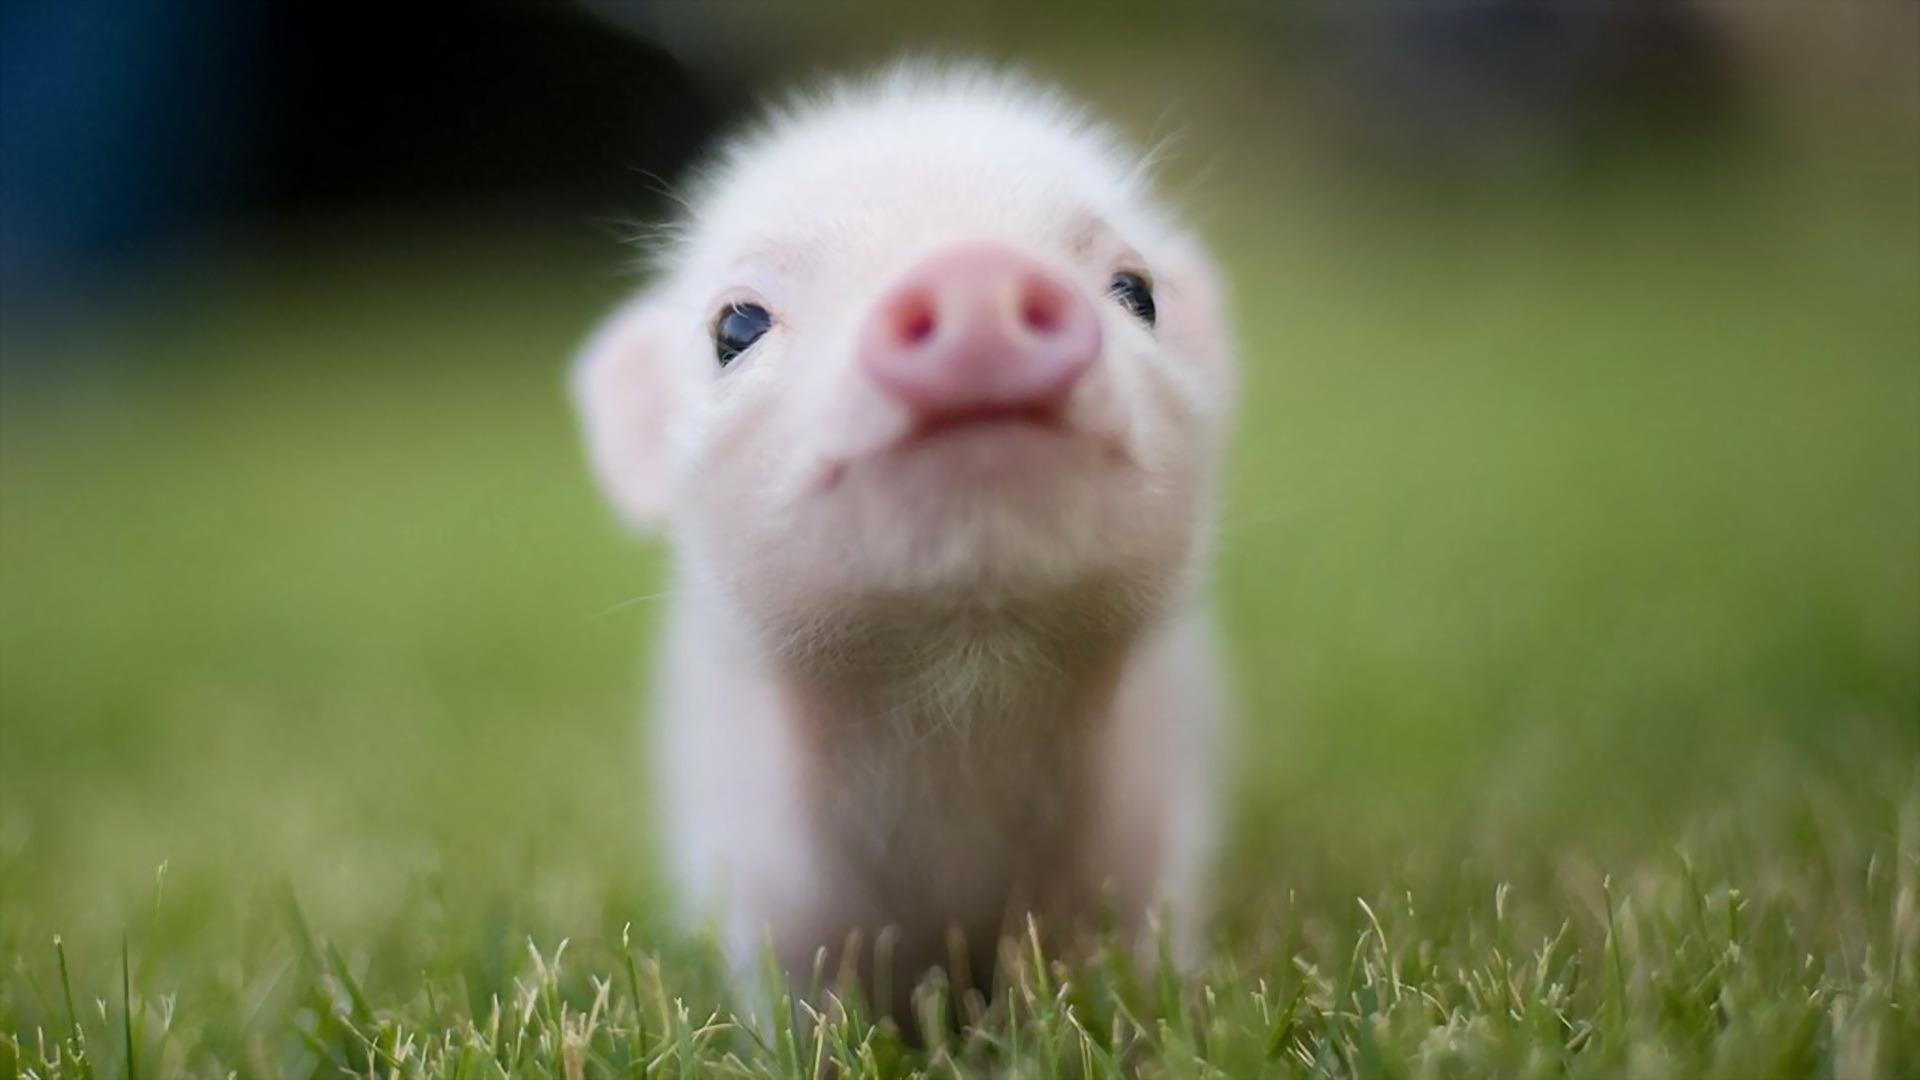 Beautiful Animals Hd Piglet Wallpaper Animal